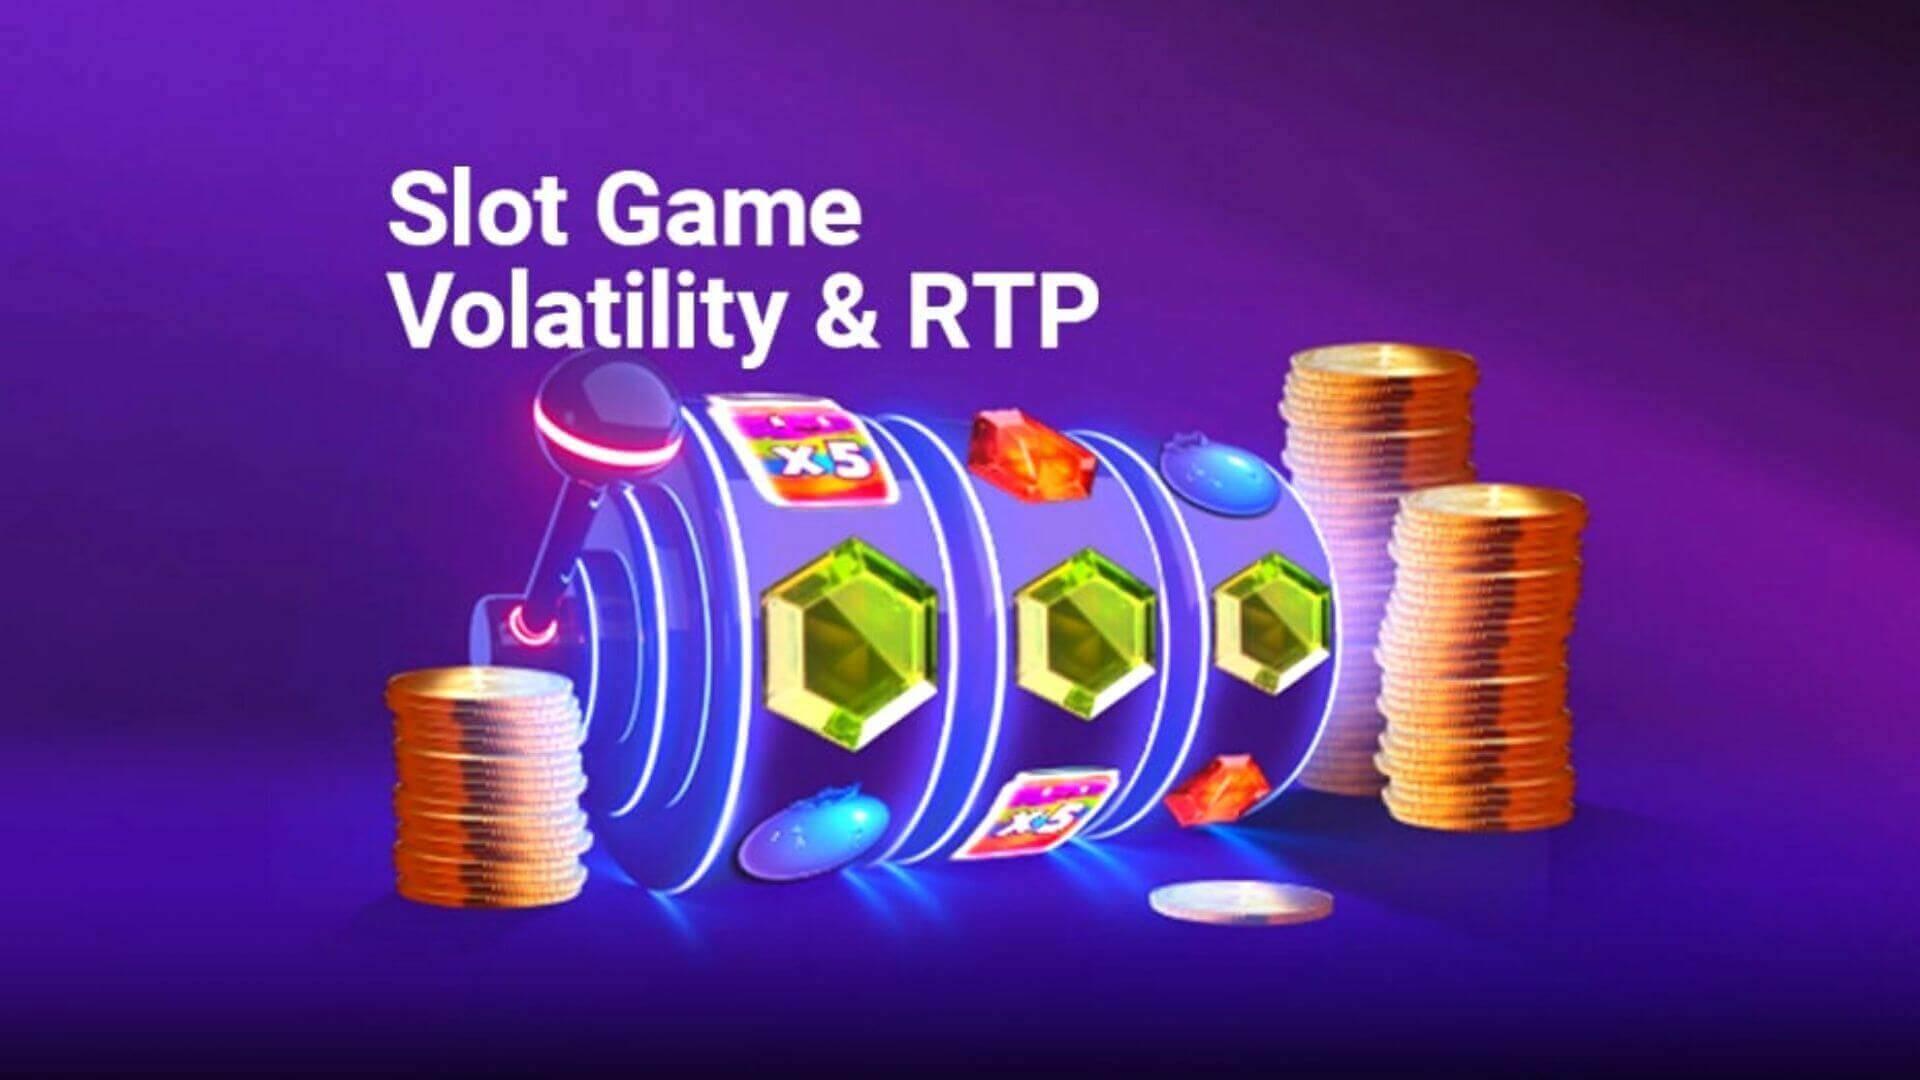 Online Slot Game Volatility & RTP